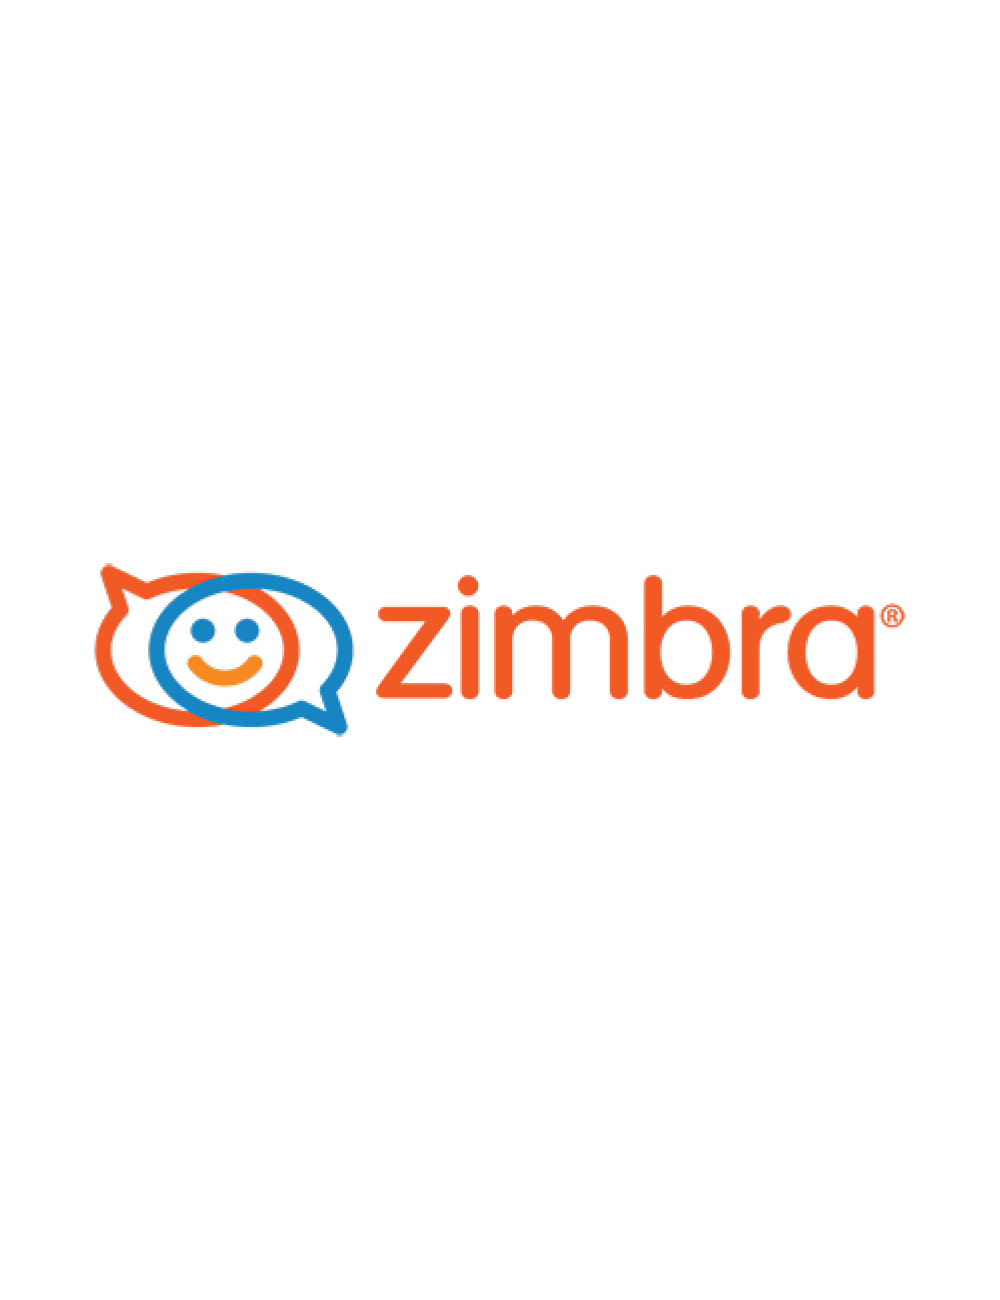 Pack 25 Standard ZIMBRA mailbox + 1 .FR domain - 1 year